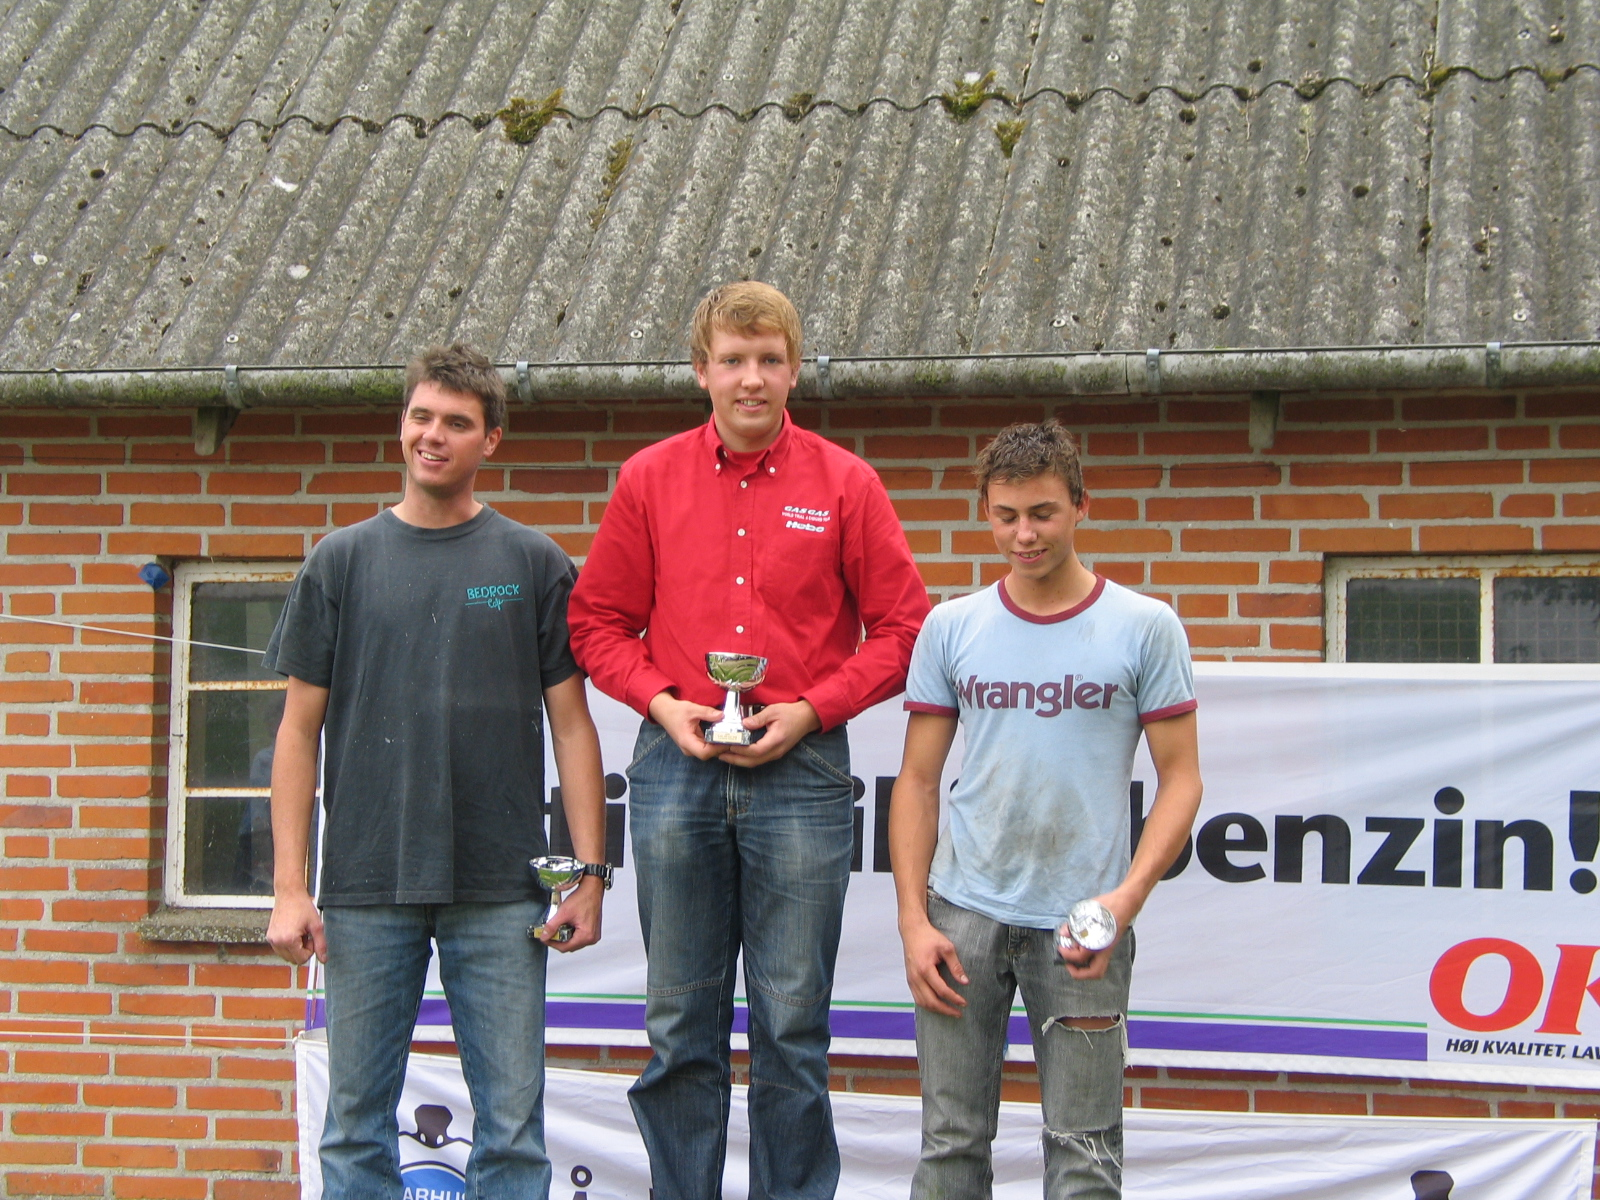 Niels Nicolaisen vandt Elite foran Thomas Pedersen og Gregers.